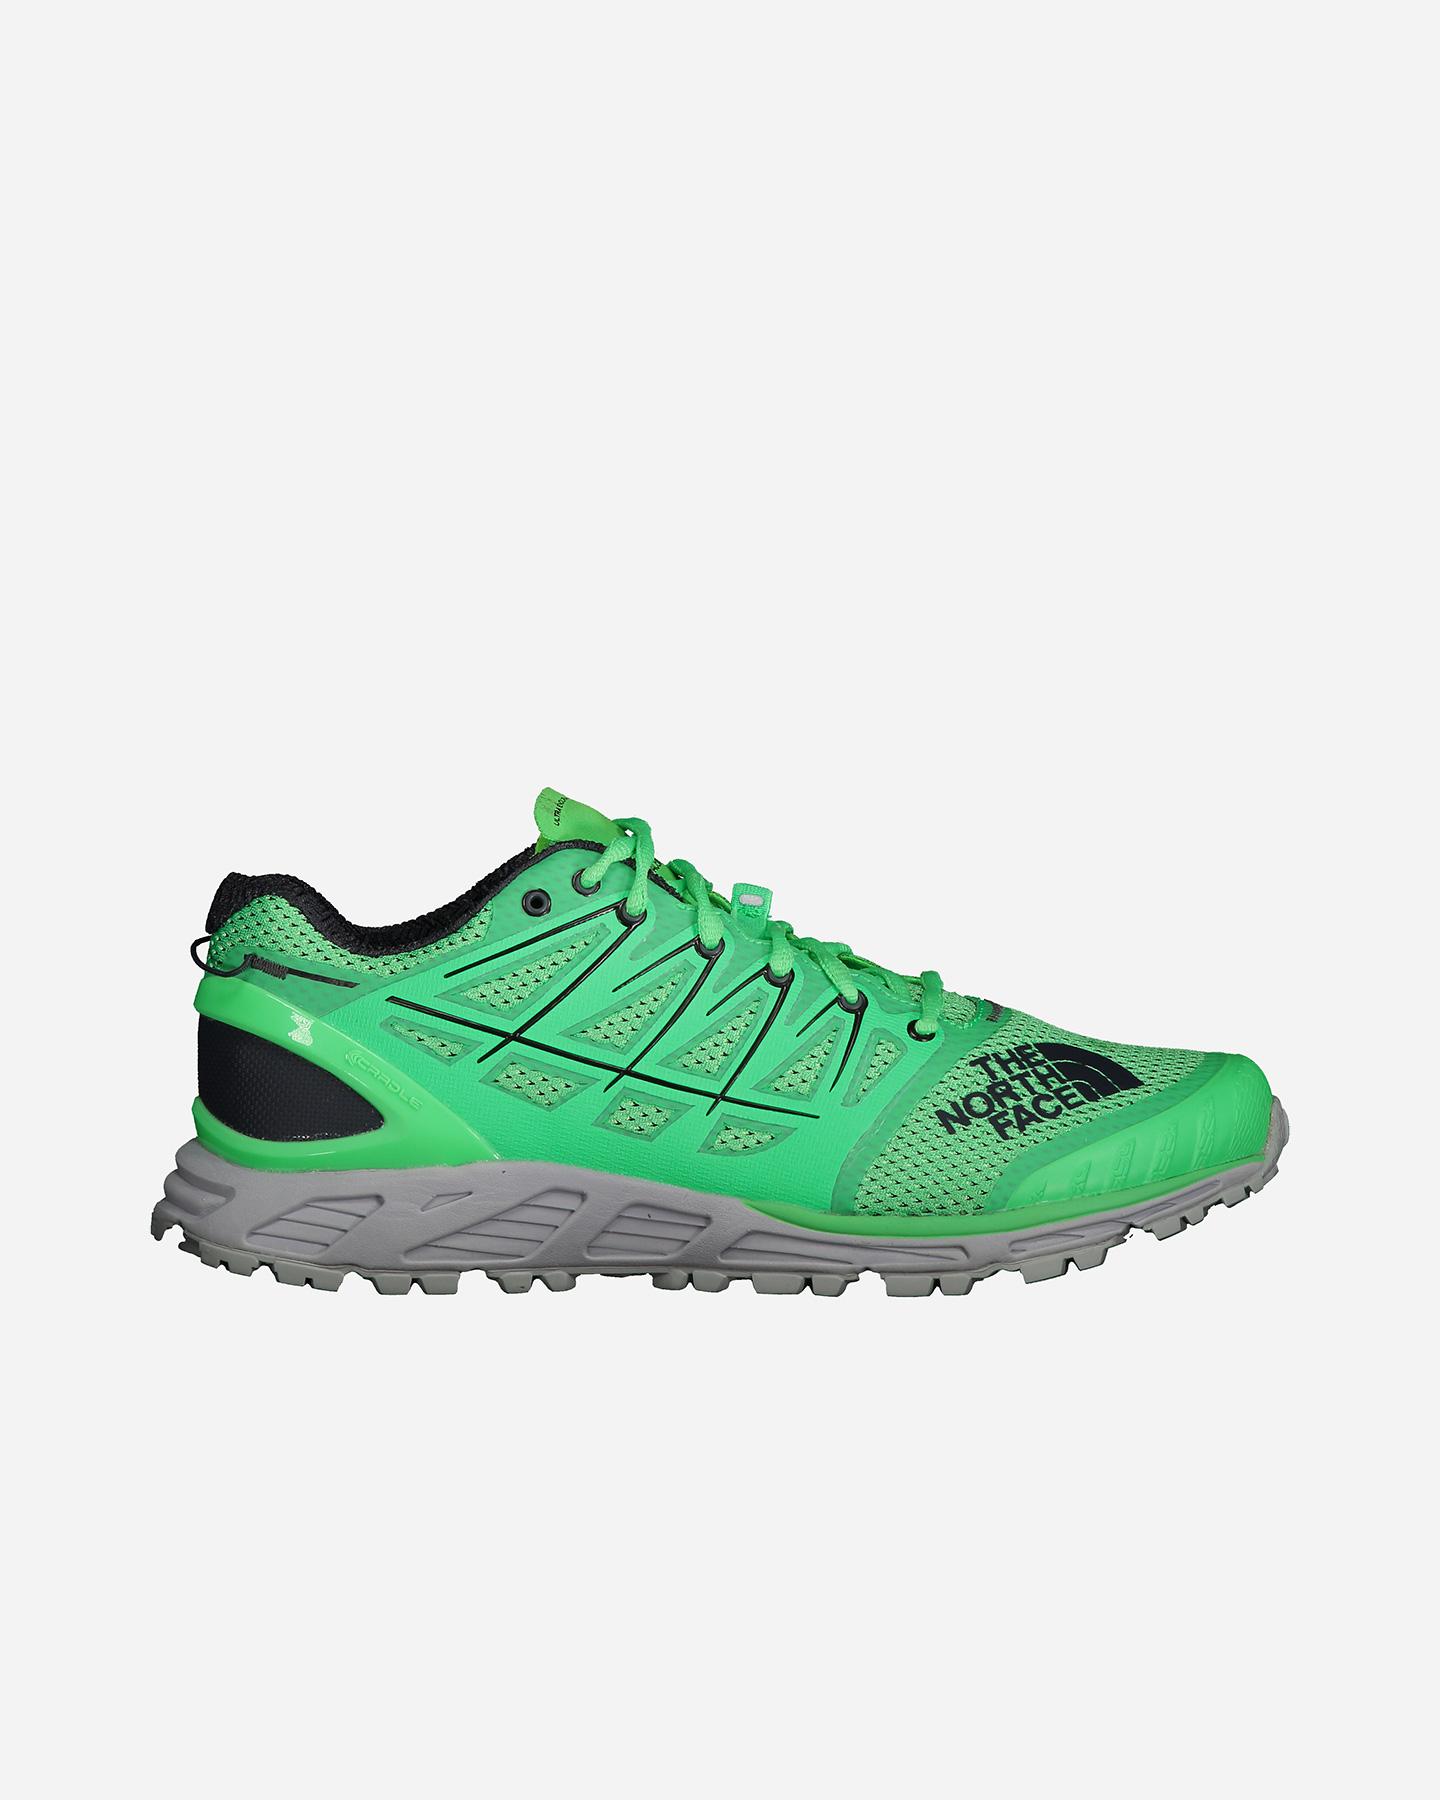 adidas endurance scarpe